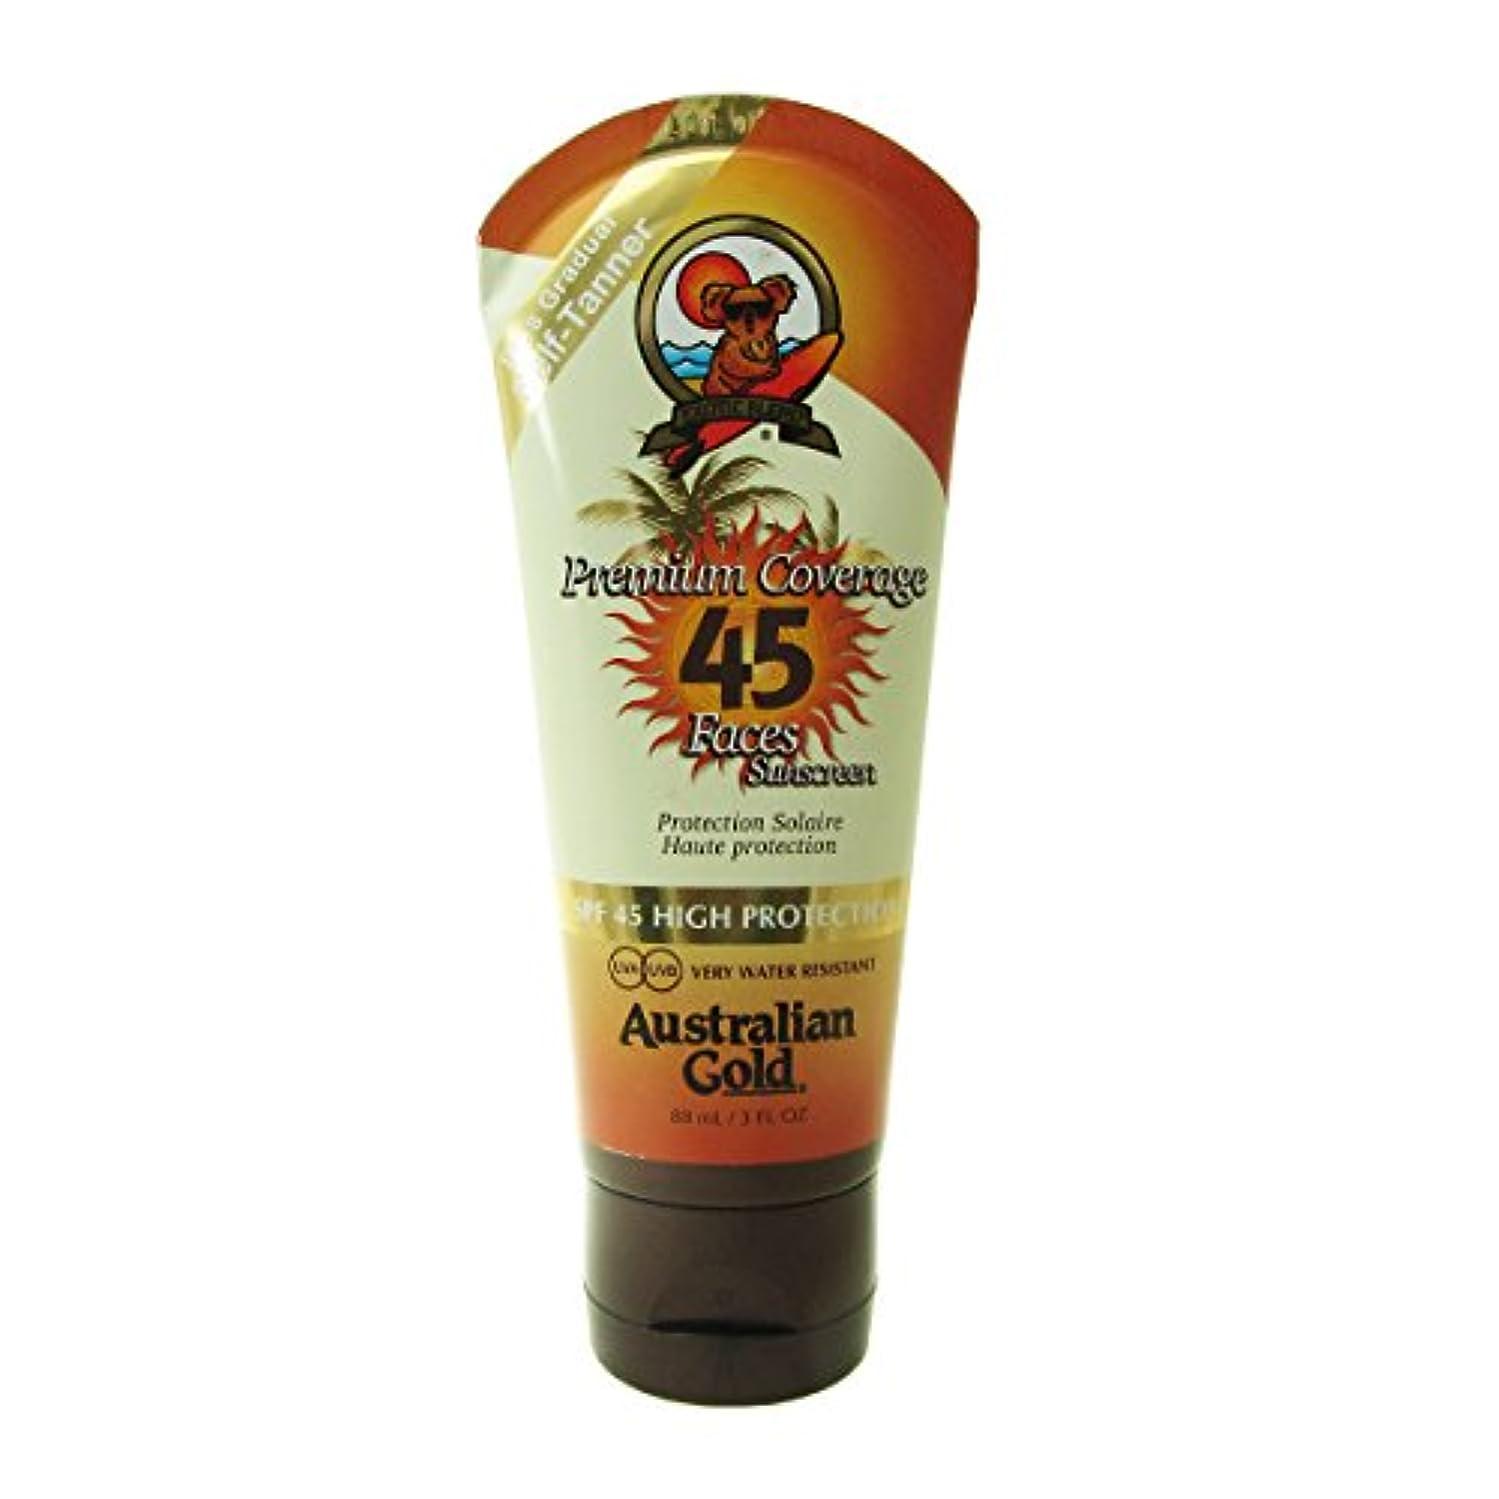 Australian Gold Sunscreen Spf 45 With Self-tanner 88ml [並行輸入品]